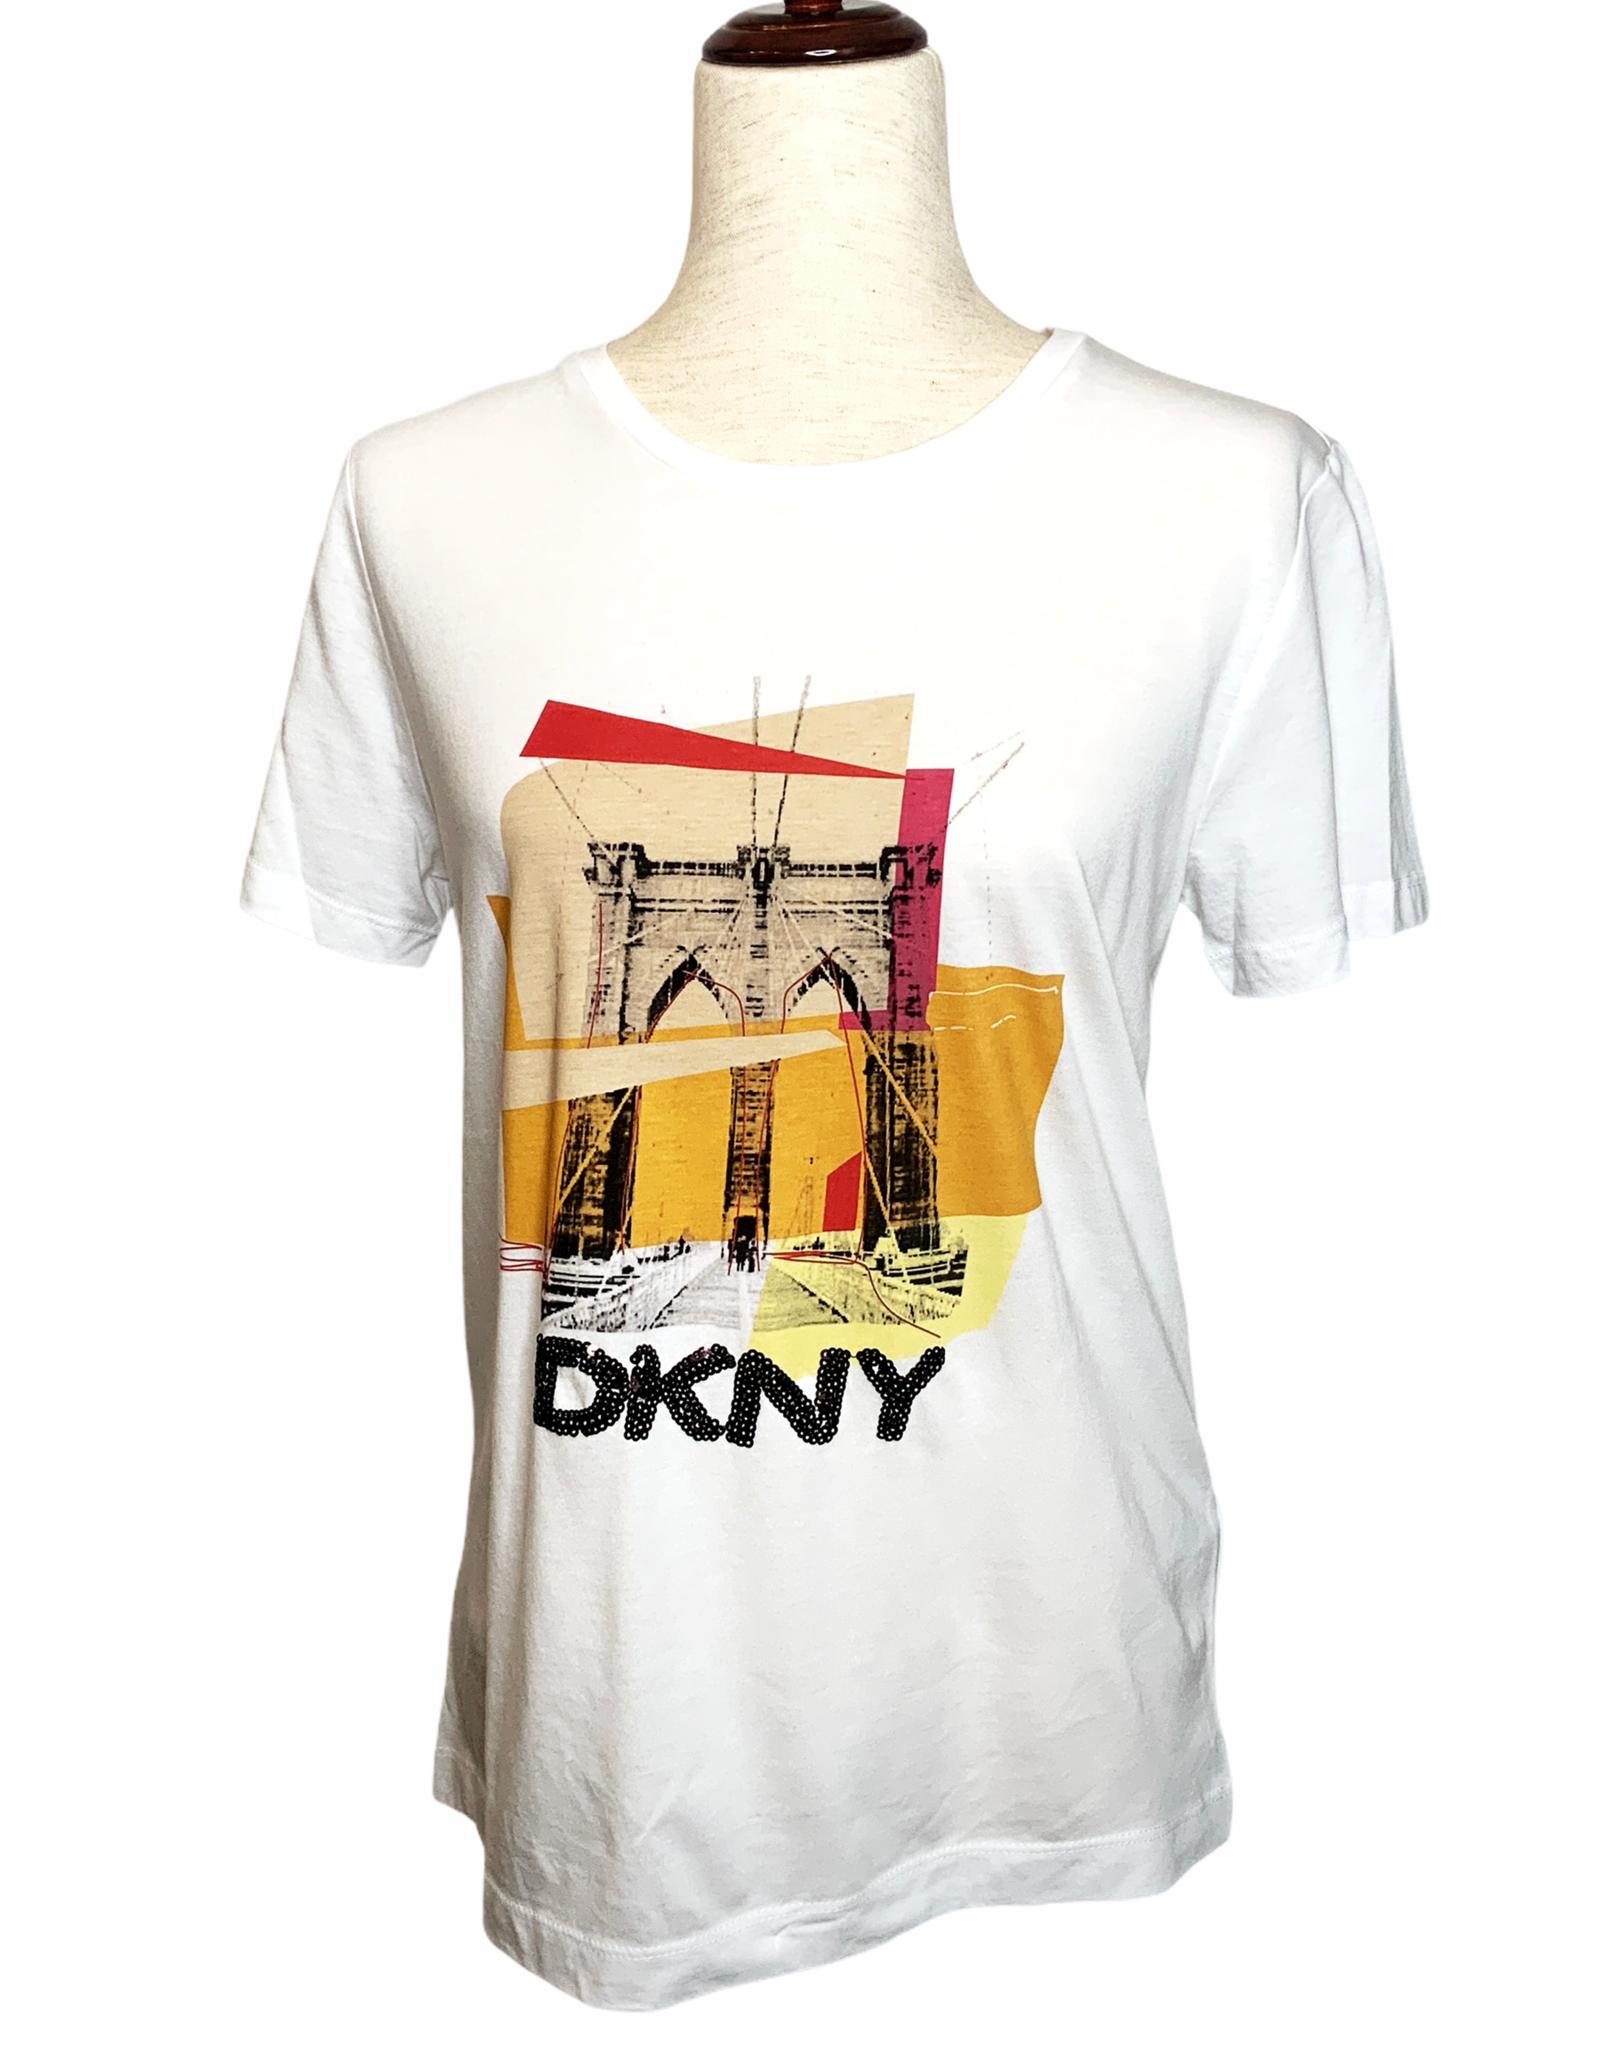 DKNY DKNY Tee Brooklyn Bridge Colorblock